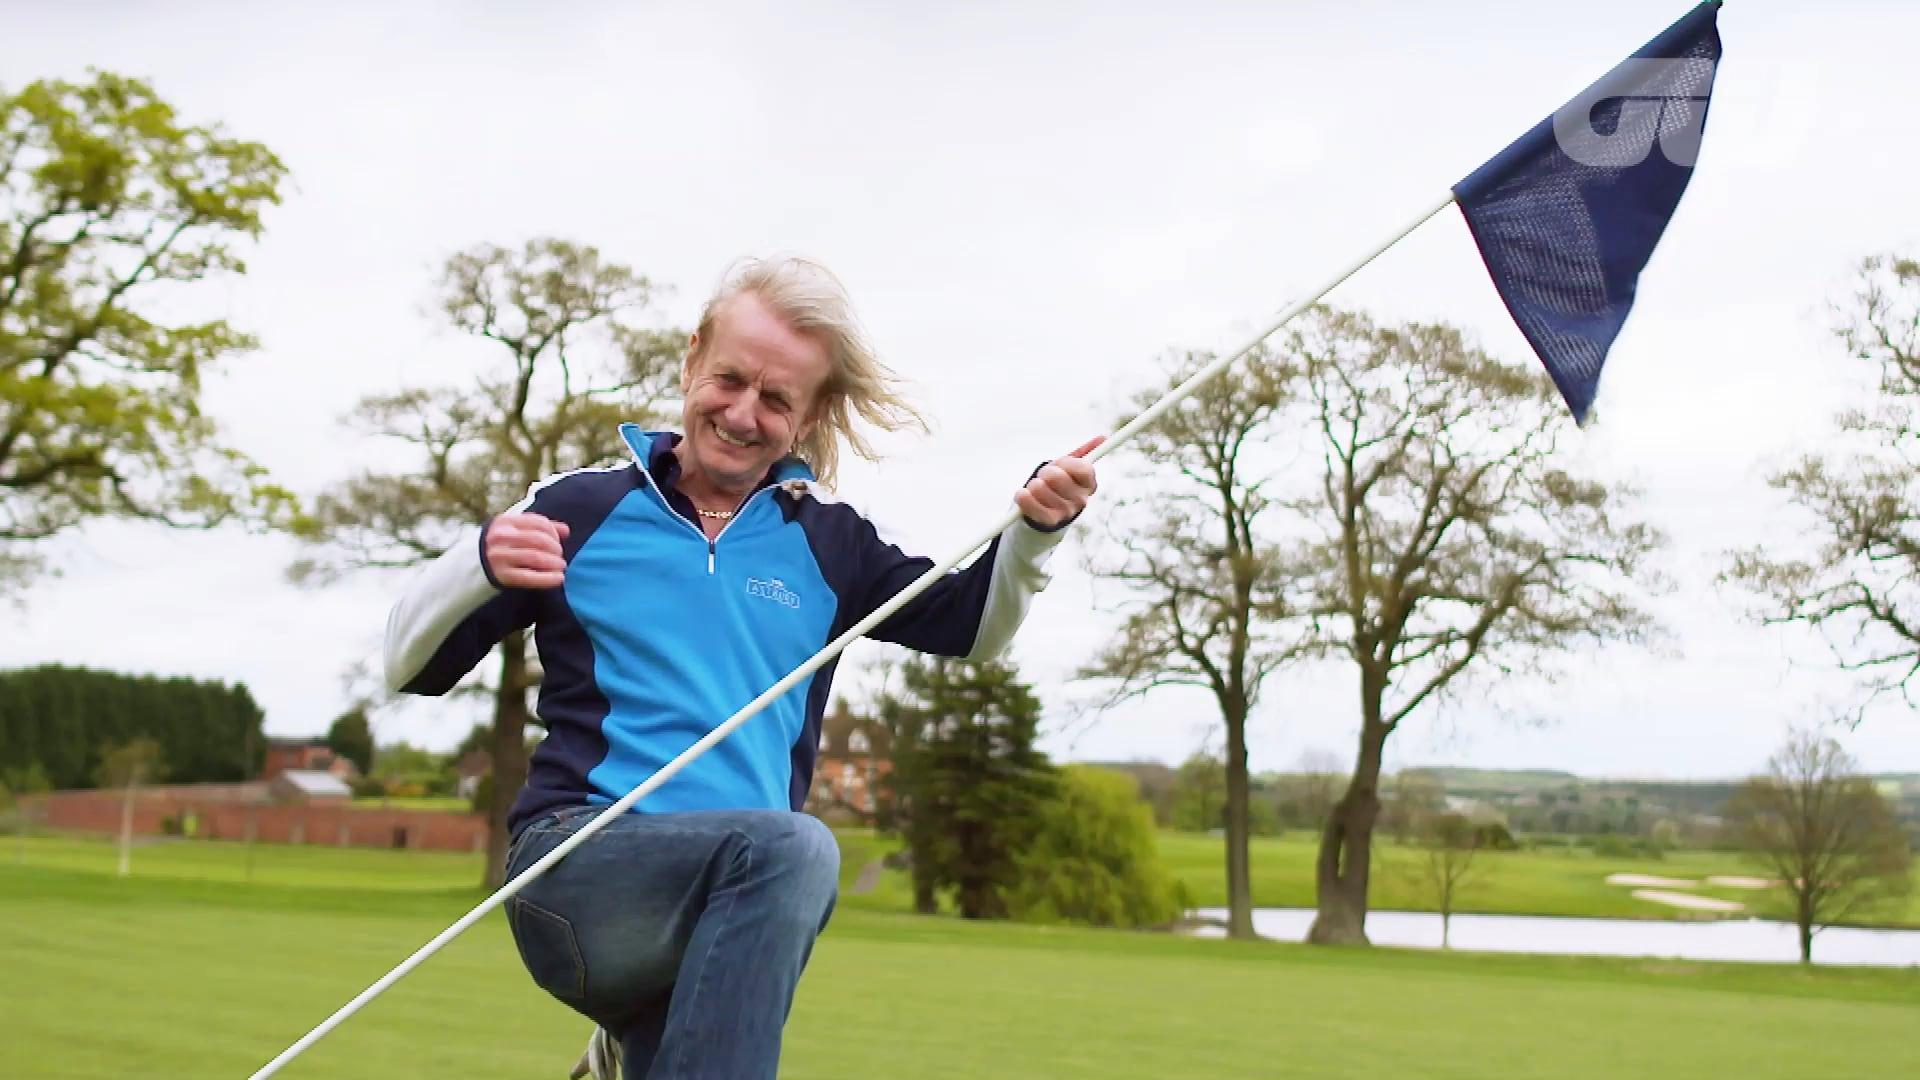 Judas Priest Guitarist K K Downing Talks Love Of Golf Golf Channel